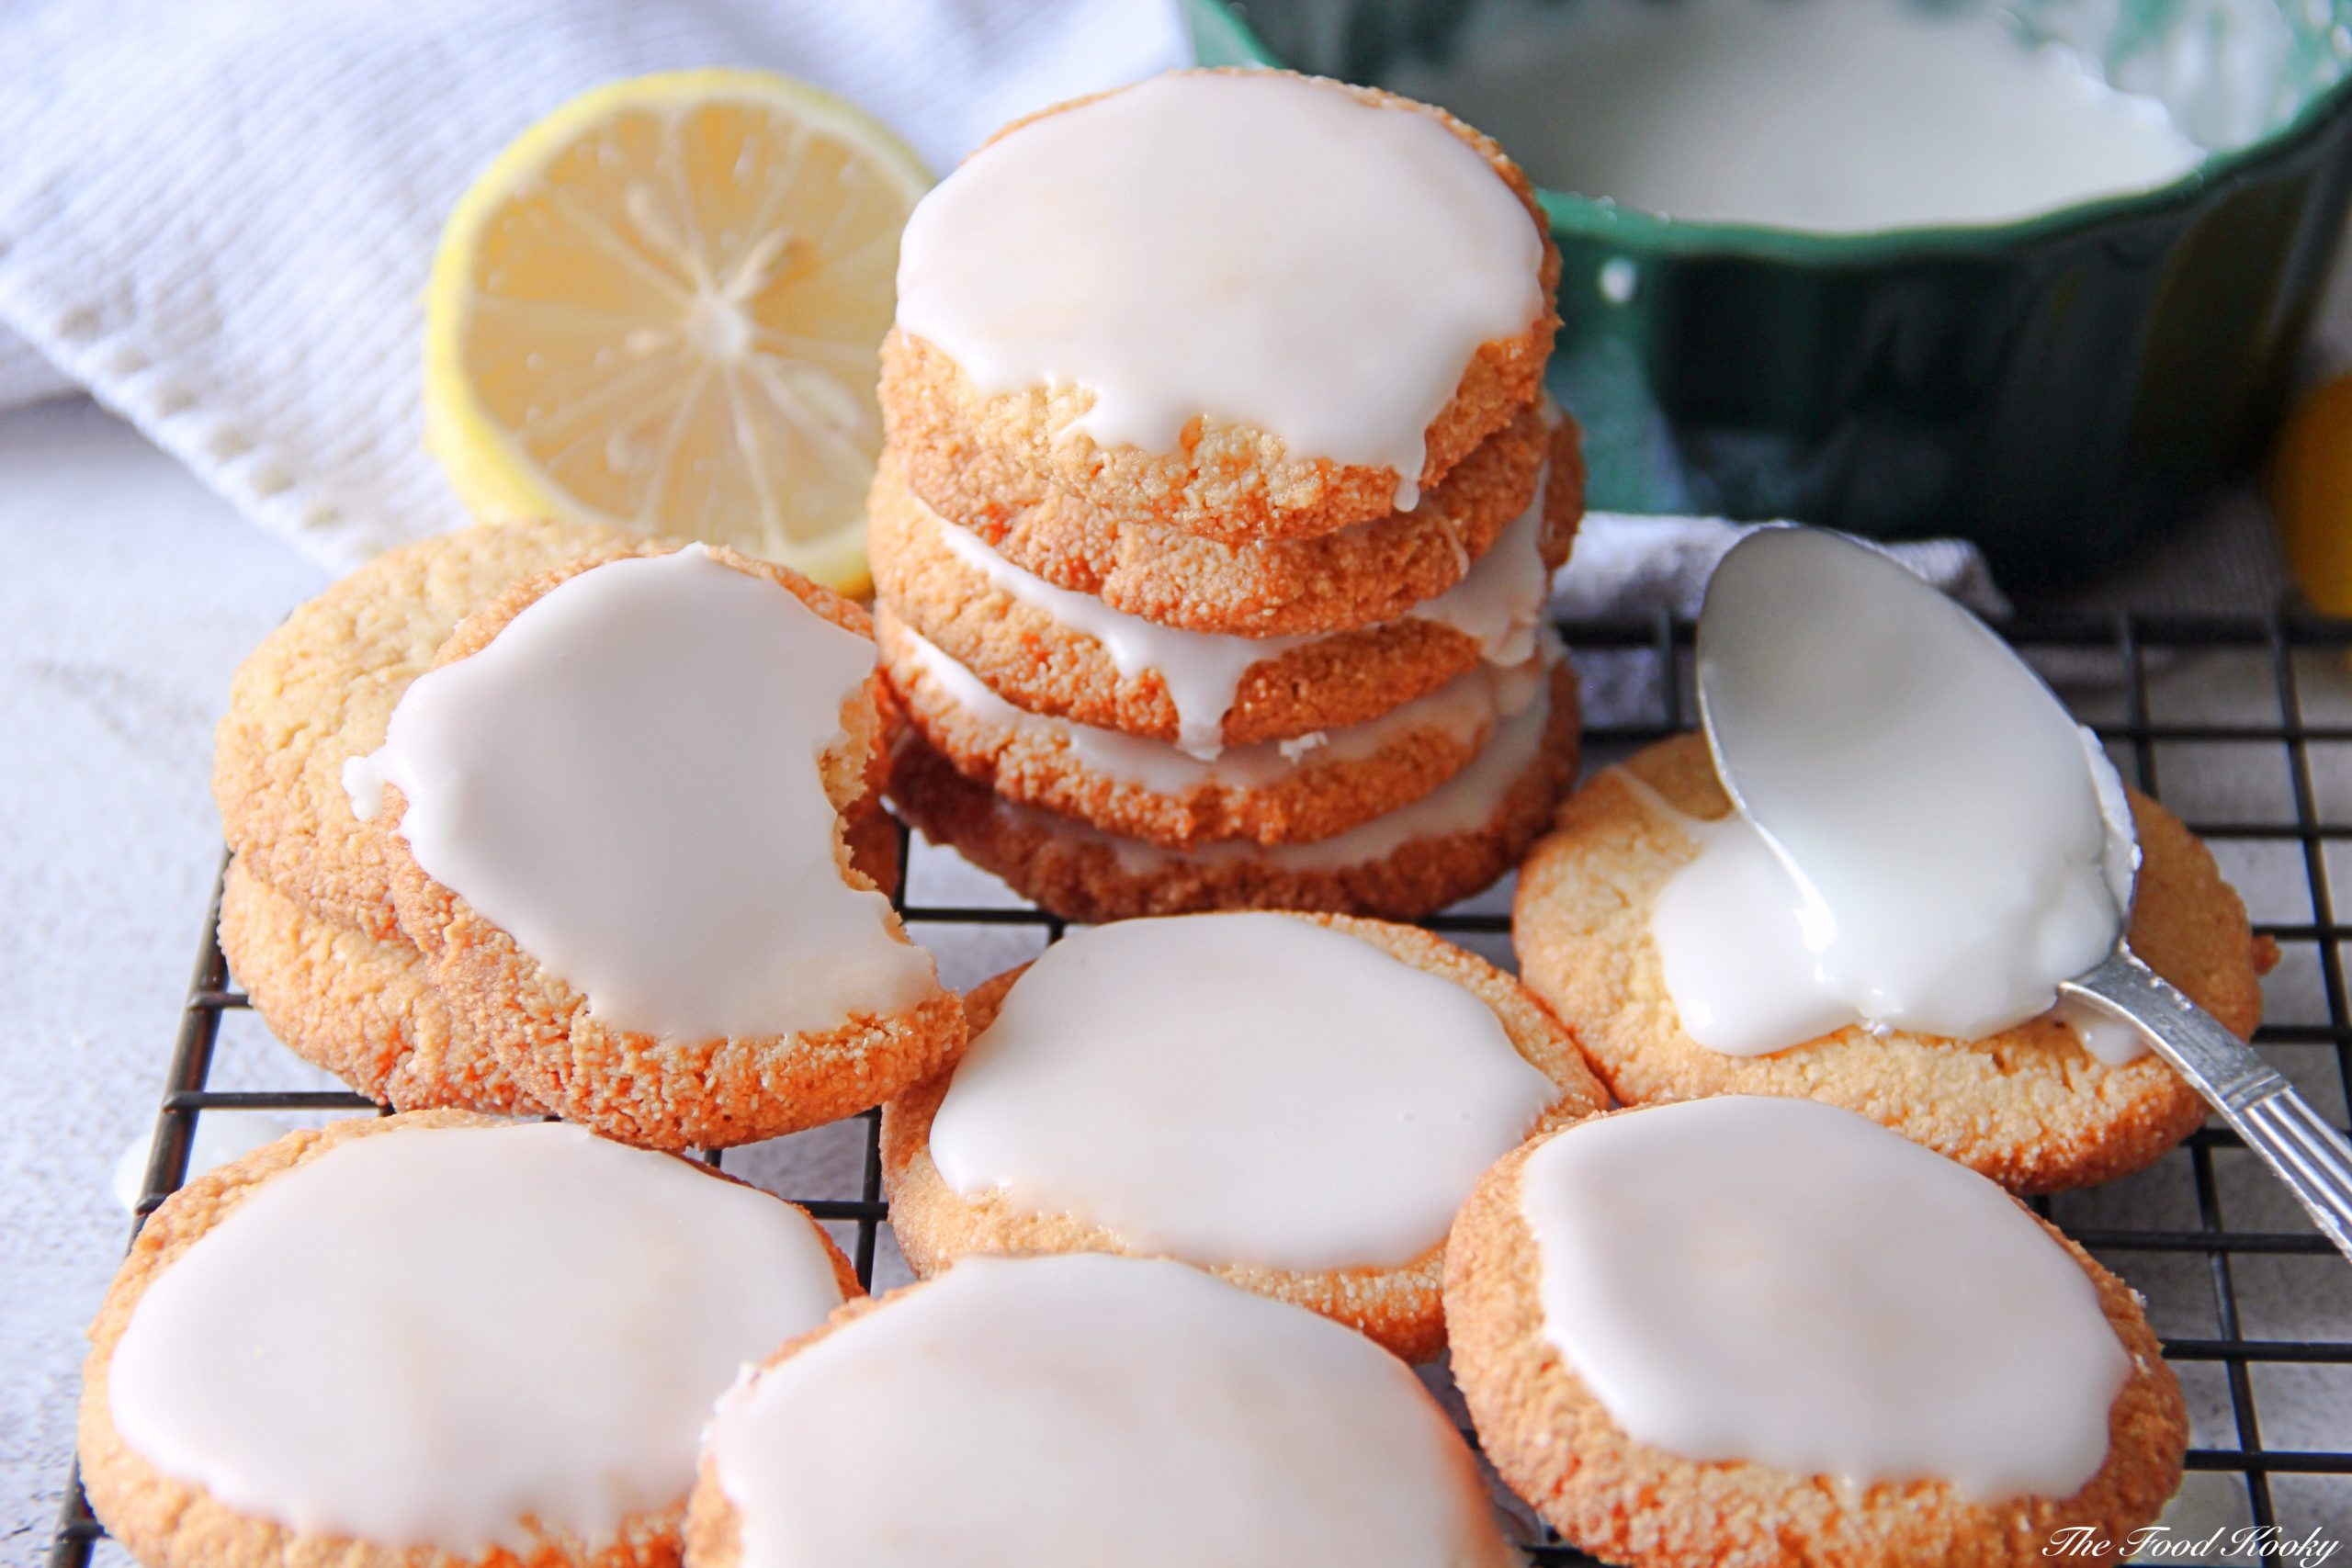 Almond Cookies with Lemon Glaze (Grain and Gluten Free)